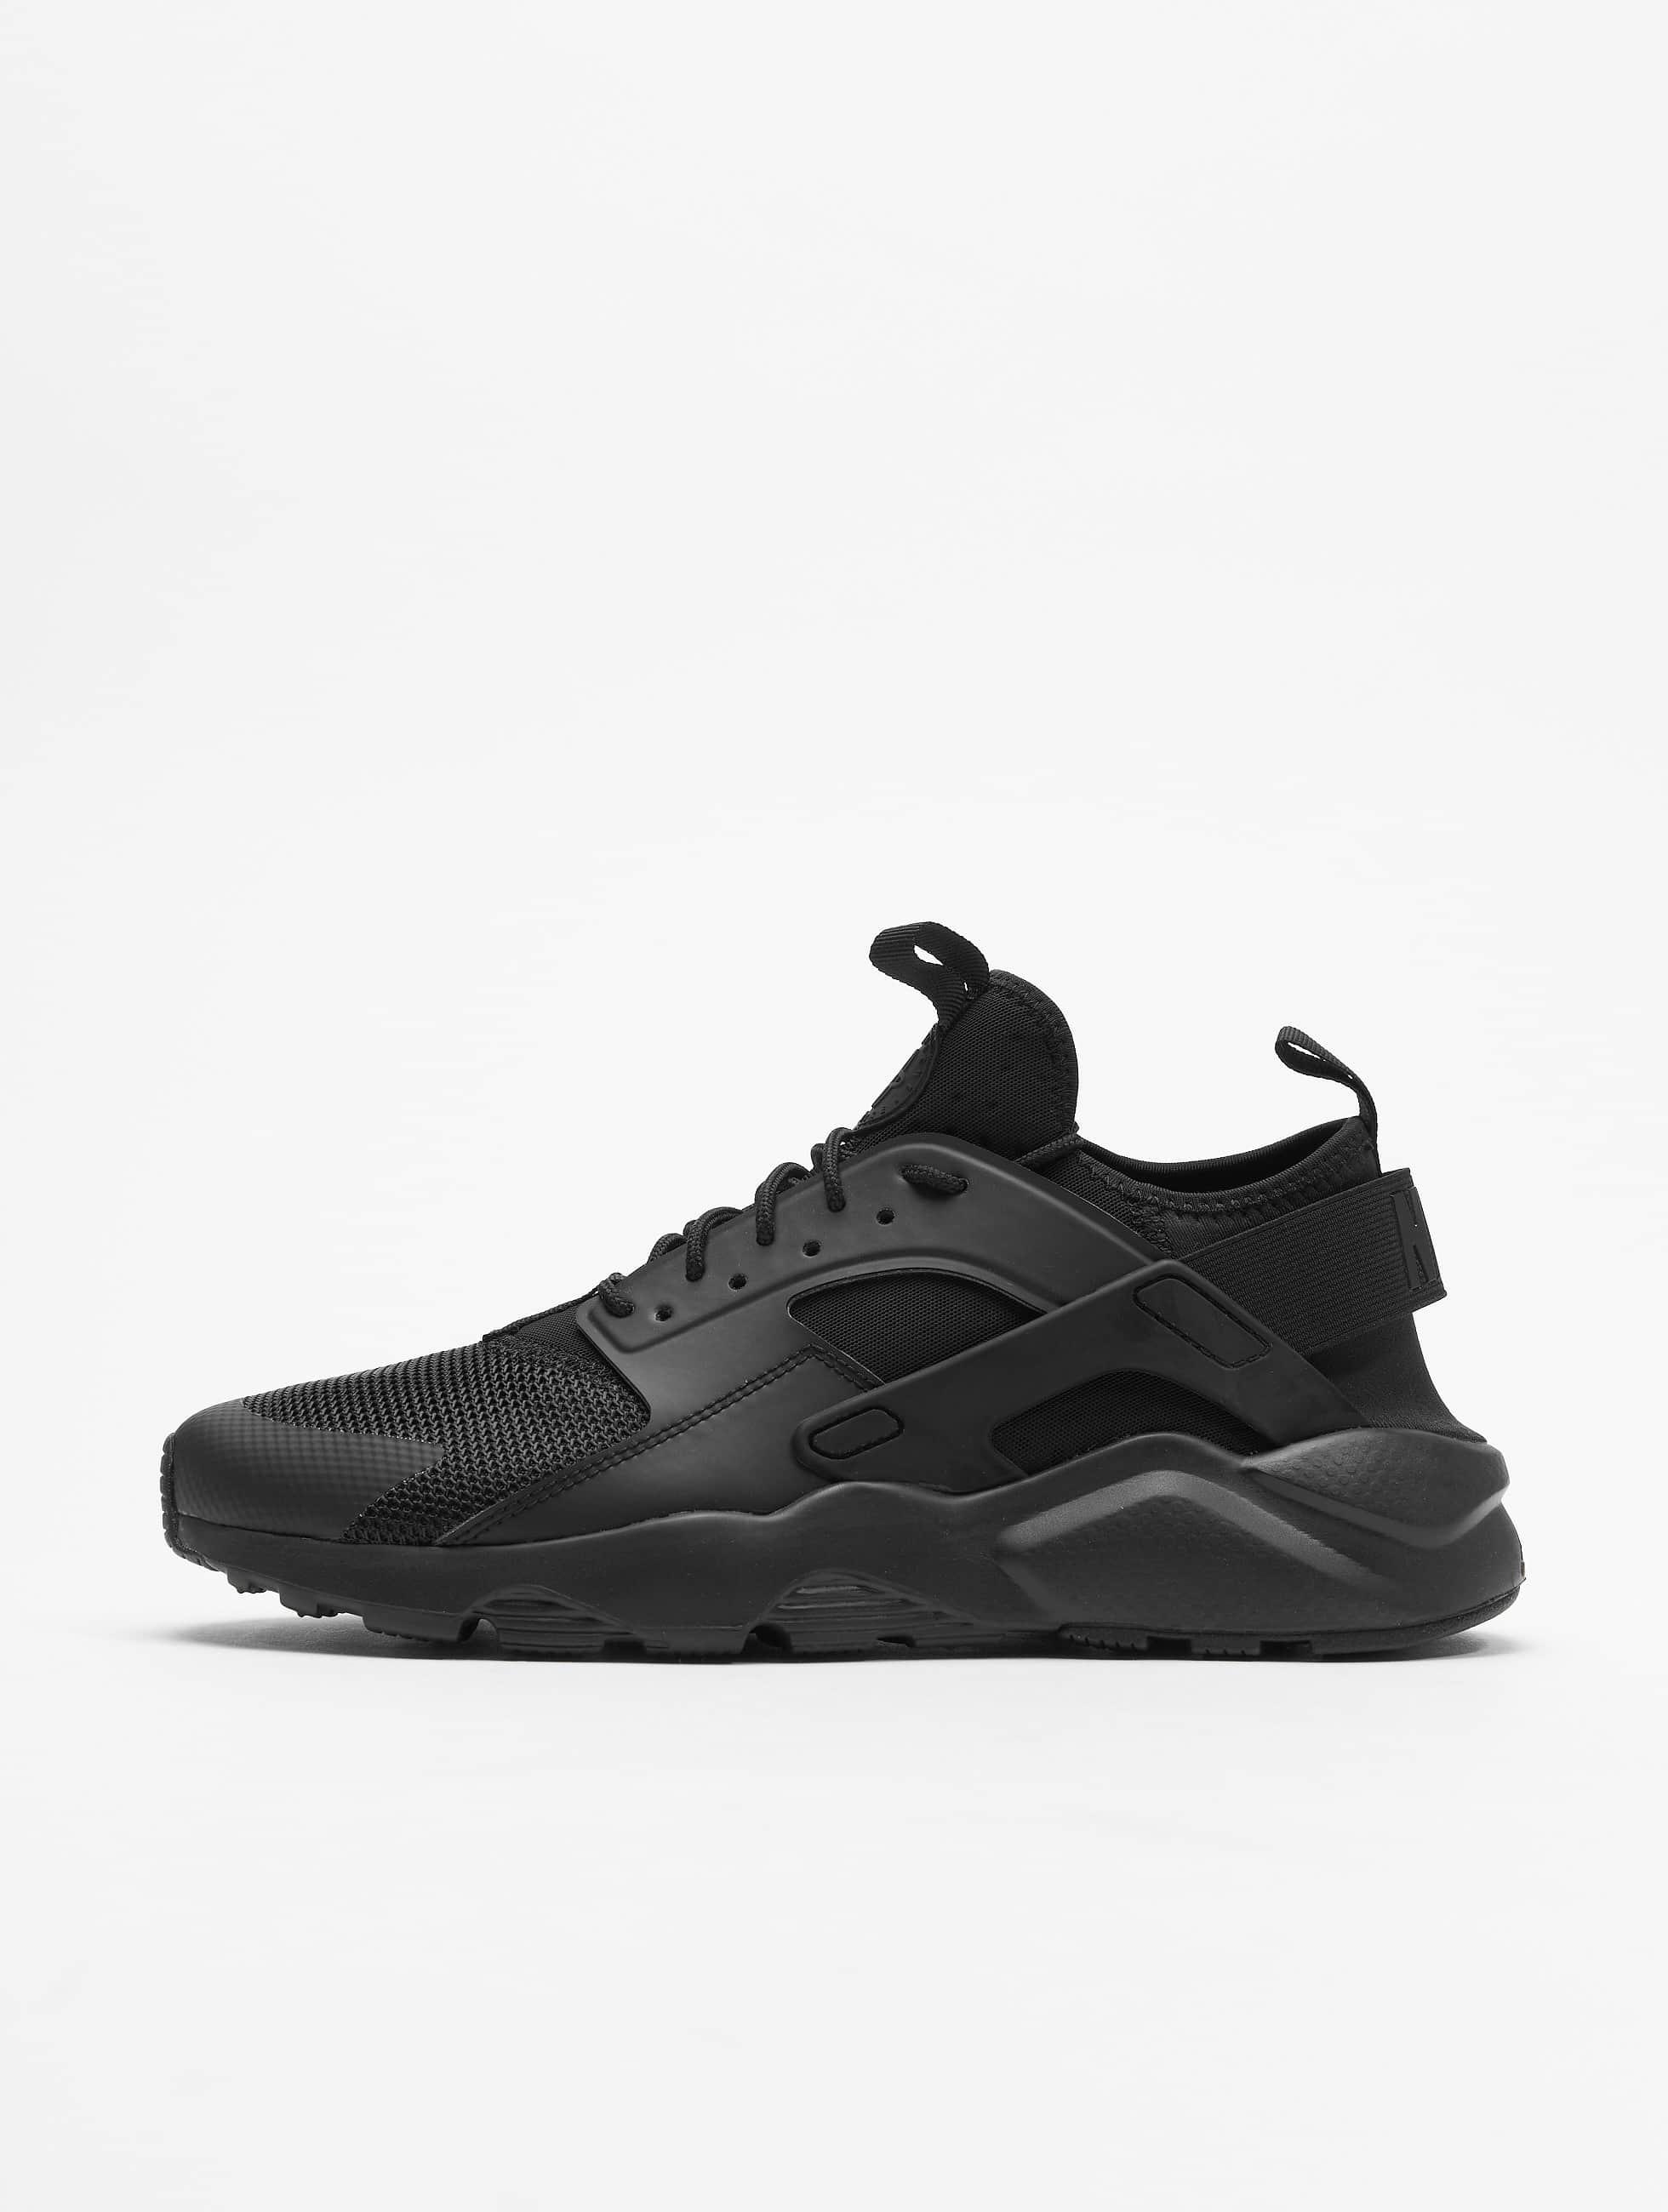 Nike Huarache Zwart Witte Zool